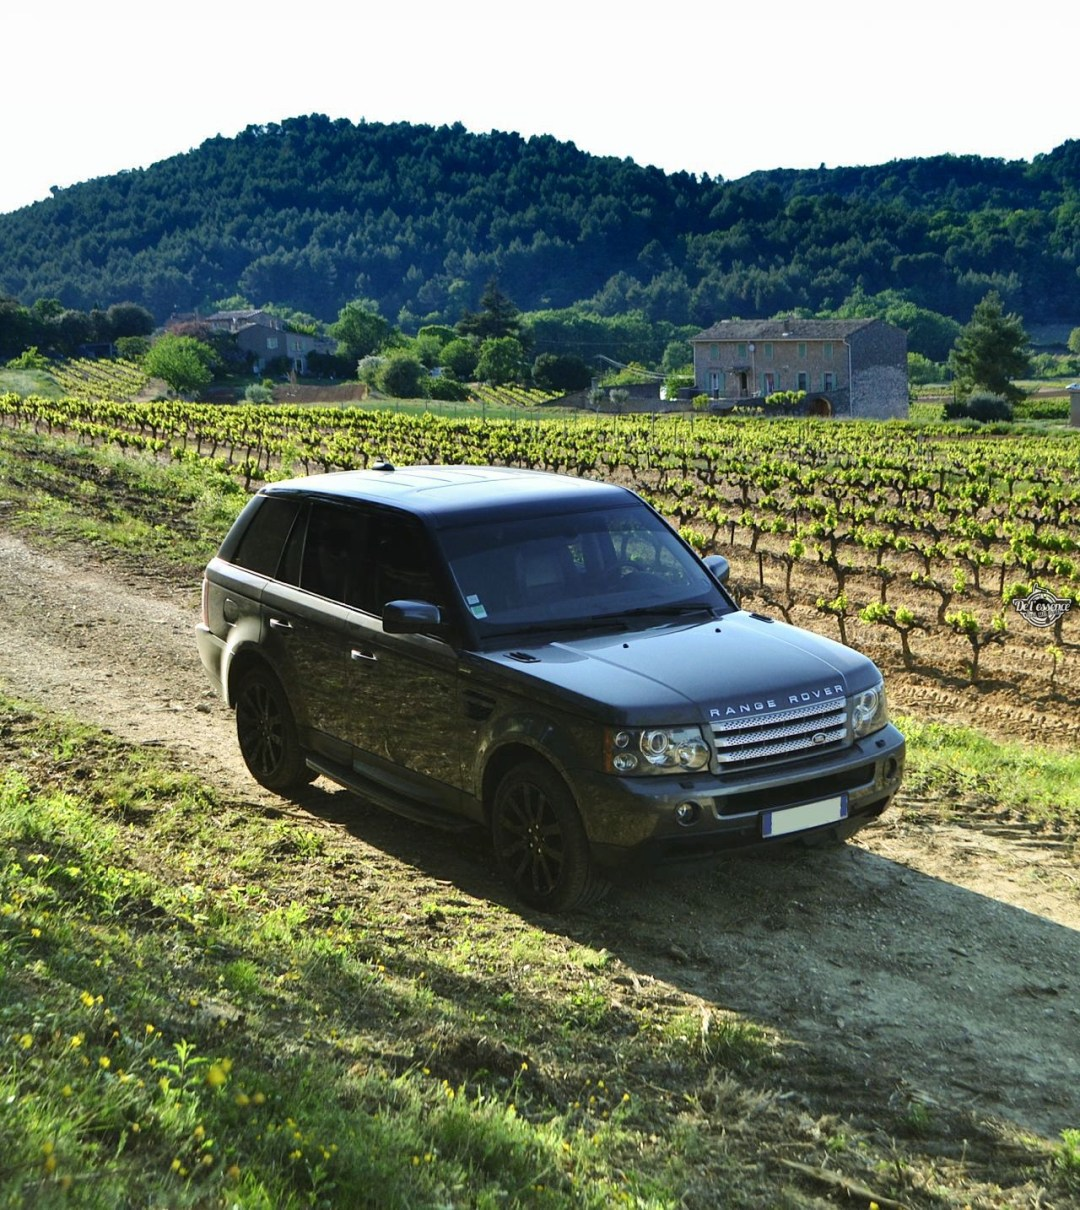 Range Rover Sport V8 Supercharged... Il est pas vert Hulk ?! 69